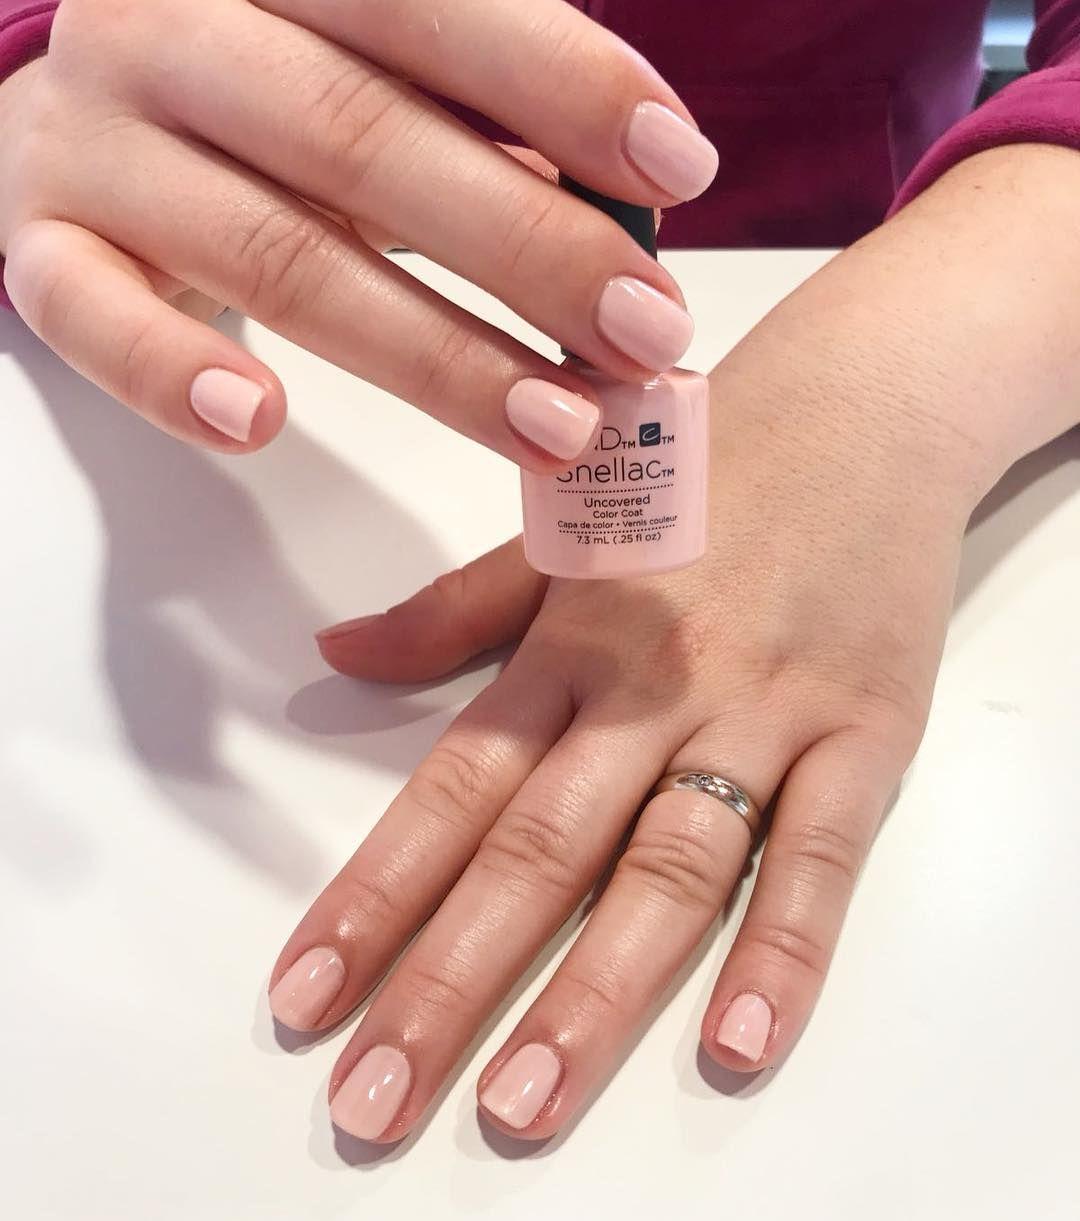 31 Likes 1 Comments Severita Studio Severitastudio On Instagram Divna Shellac Uncovered Trajni Cnd Shellac Colors Nails Shellac Nail Colors